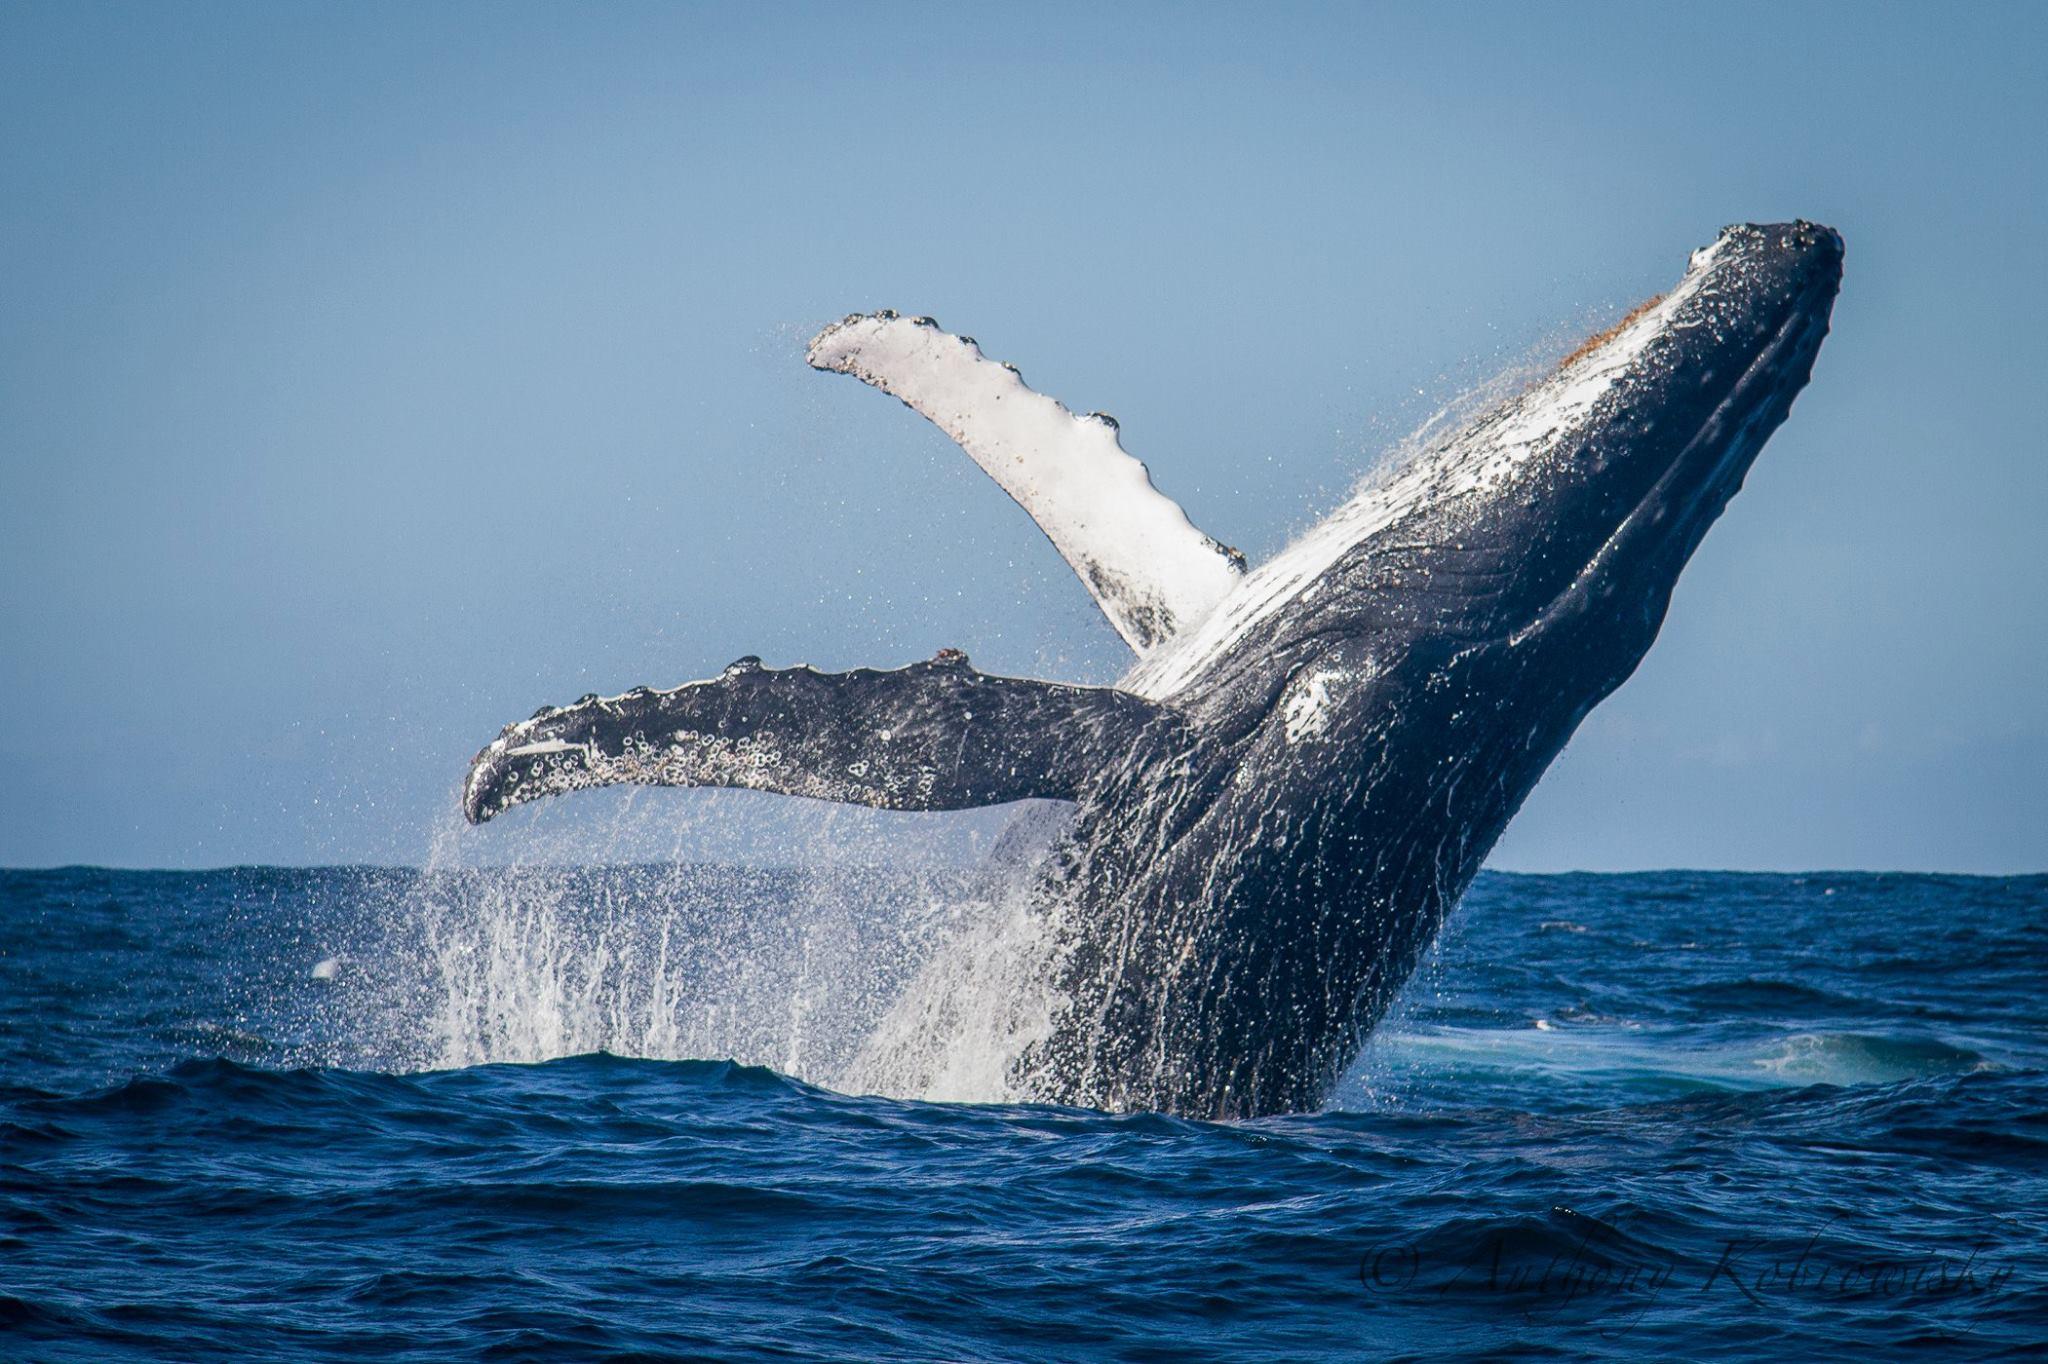 Humpback-Whale-Sea-Candy-Media